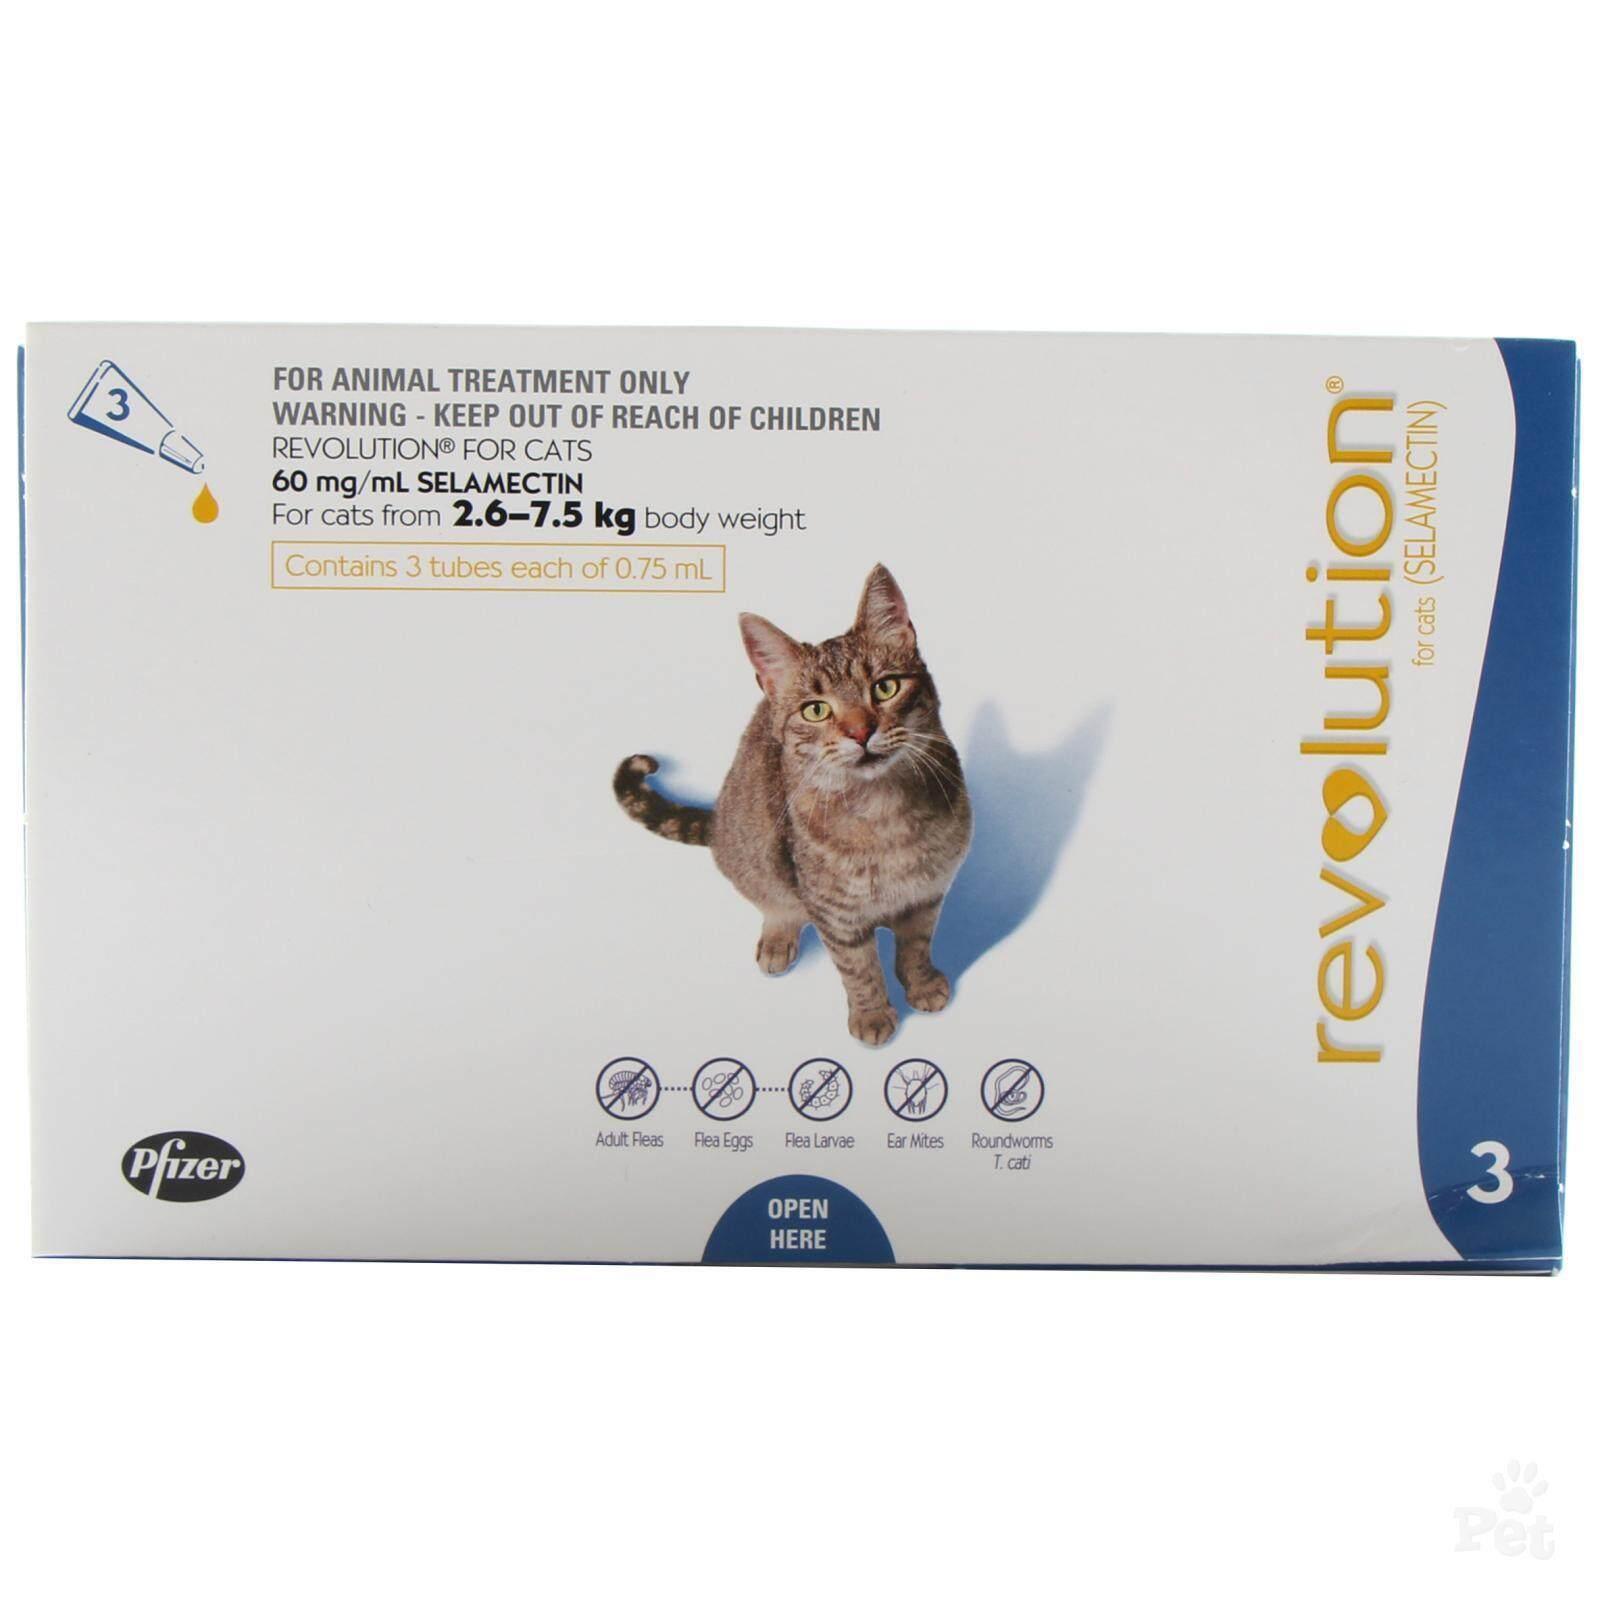 Revolutionเรฟโว ลูชั่น ยาหยอดกำจัด เห็บ หมัด แมว น้ำหนัก 2.6 - 7.5 กก. ( 1กล่อง 3หลอด) By Speedpets.